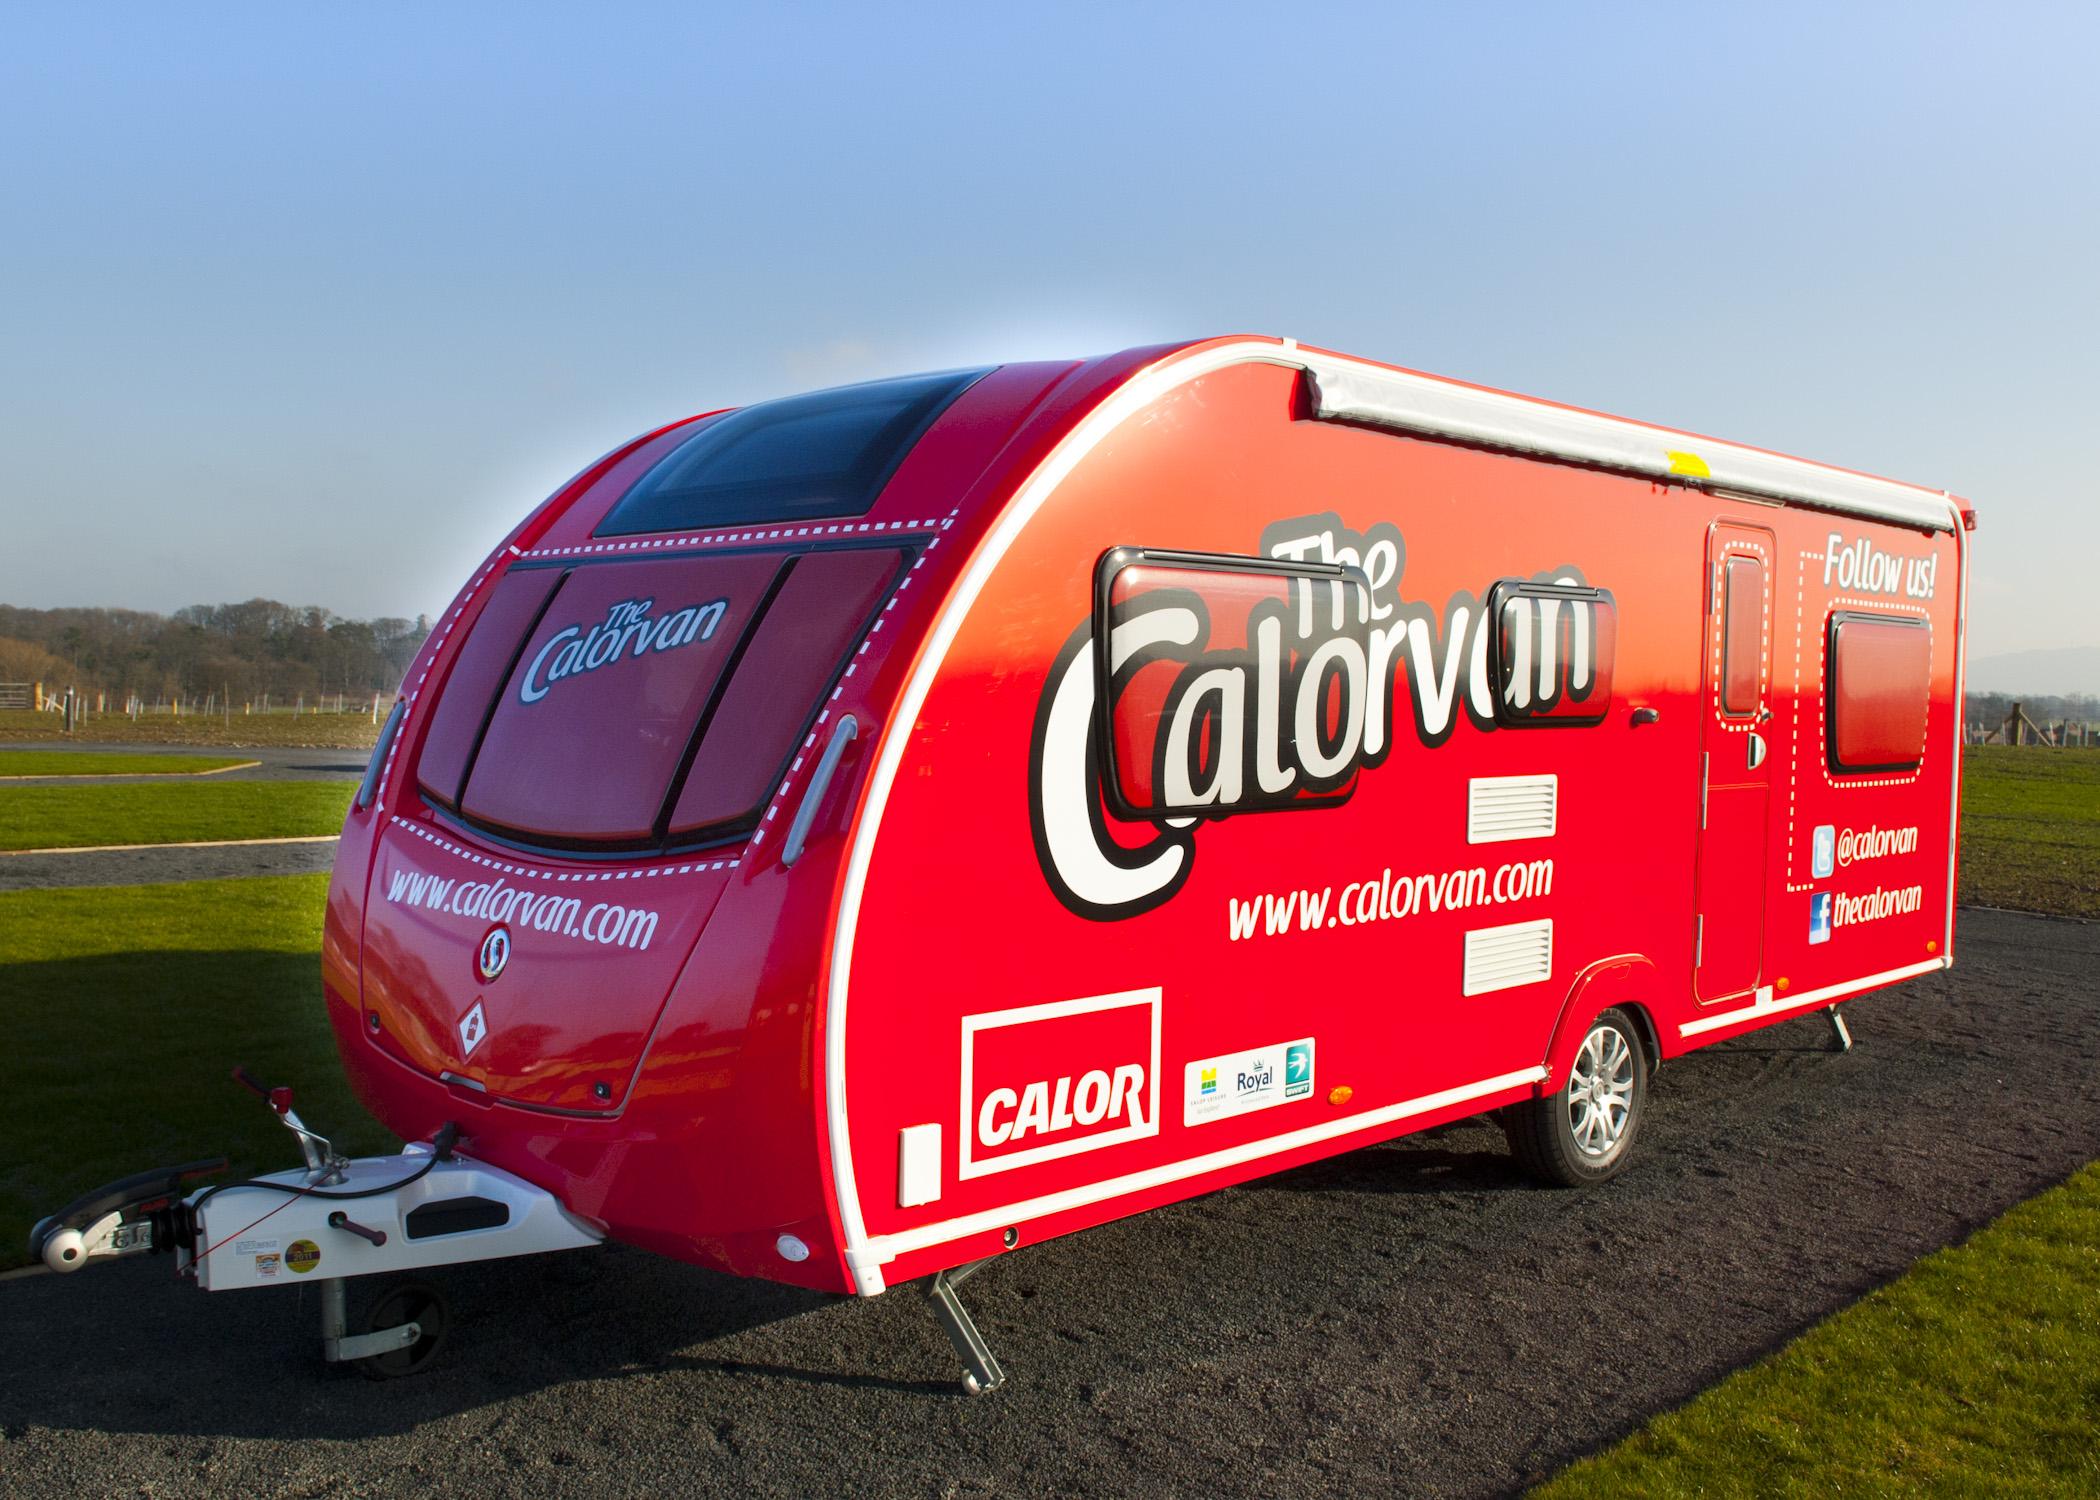 The Calorvan